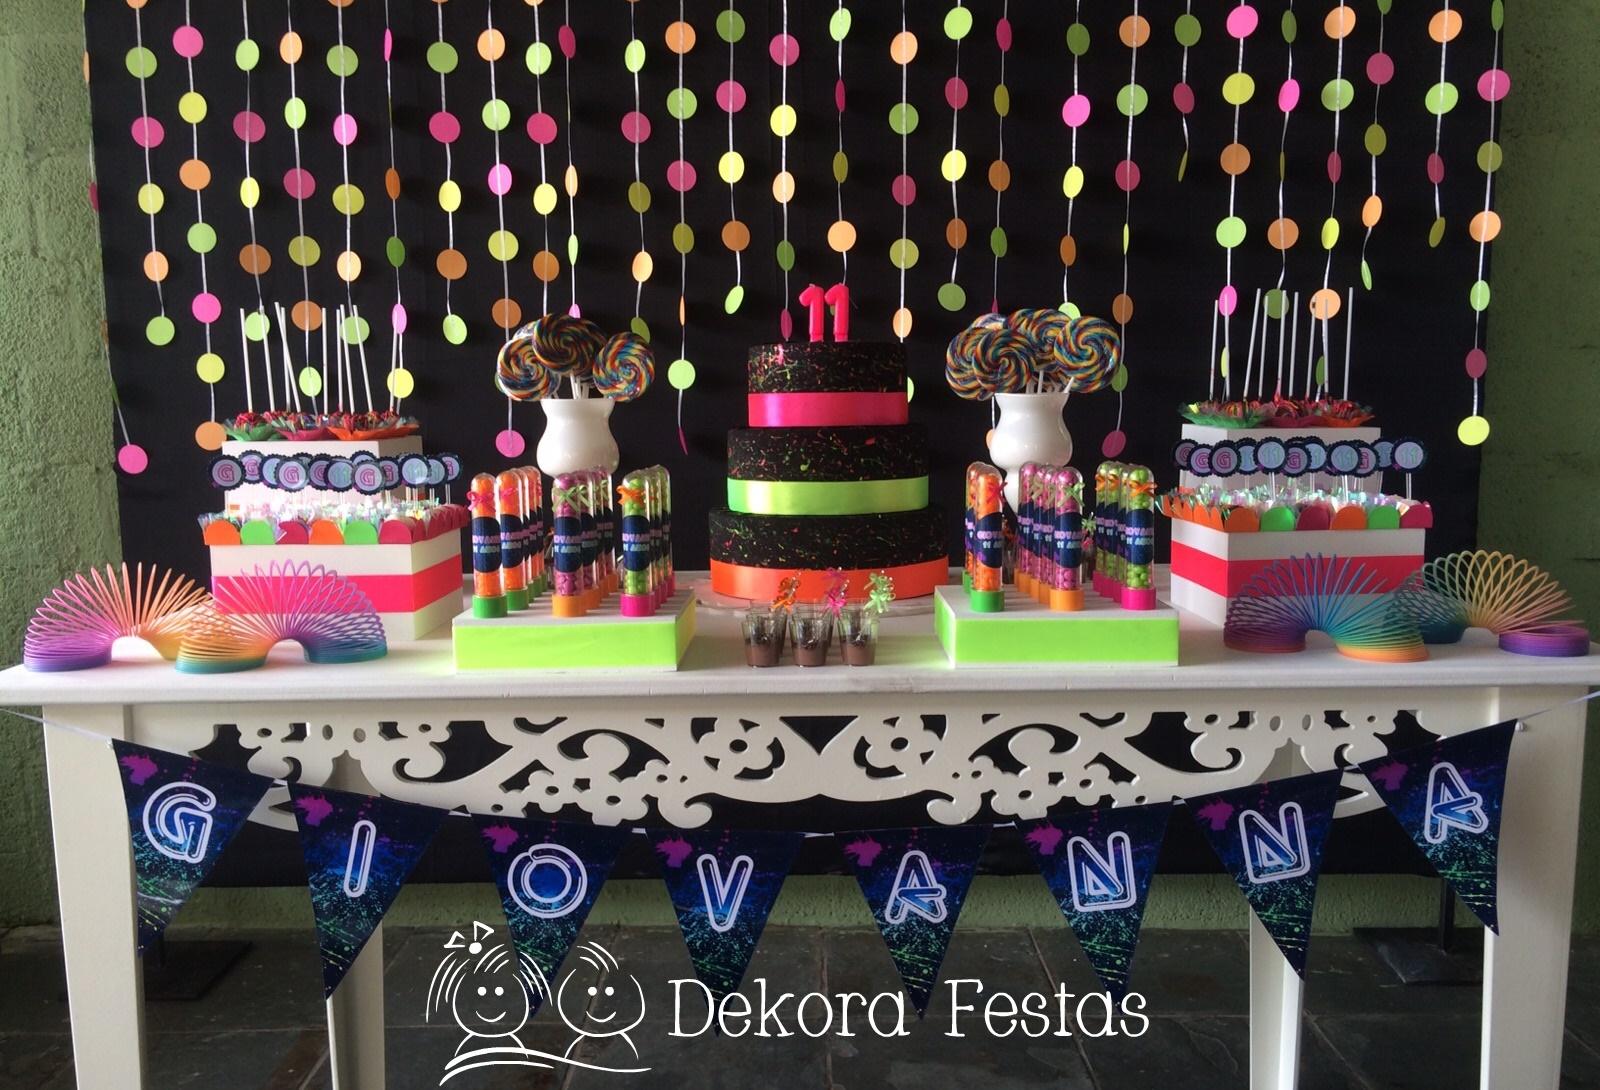 decoracao festa neon:decoracao-neon-moveis-provencal-guarulhos decoracao-neon-painel-de